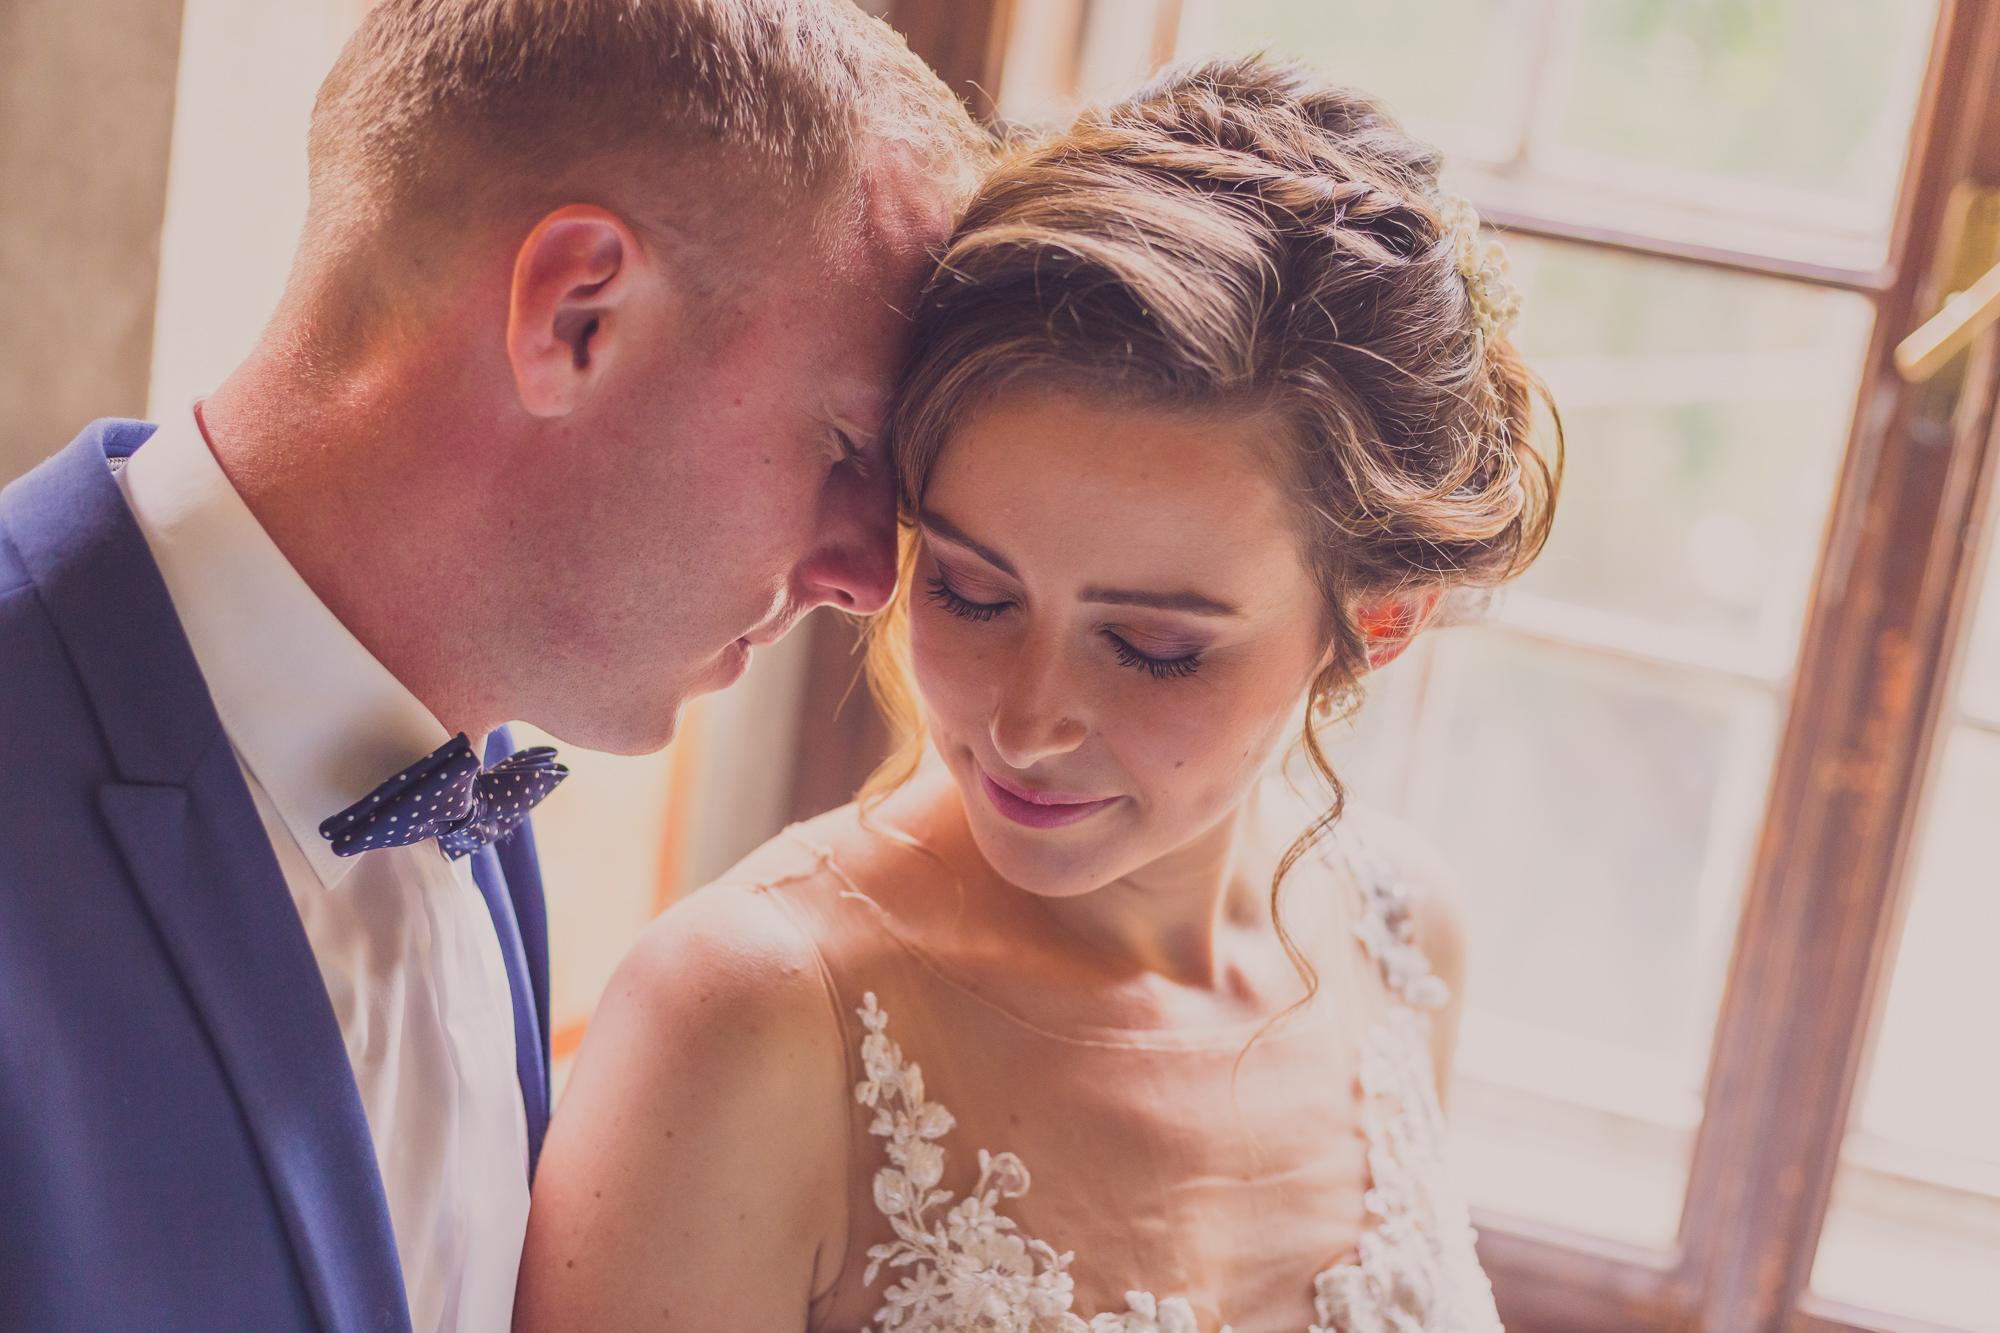 fotografie de nunta, miri, cadru apropiat cu mire mireasa